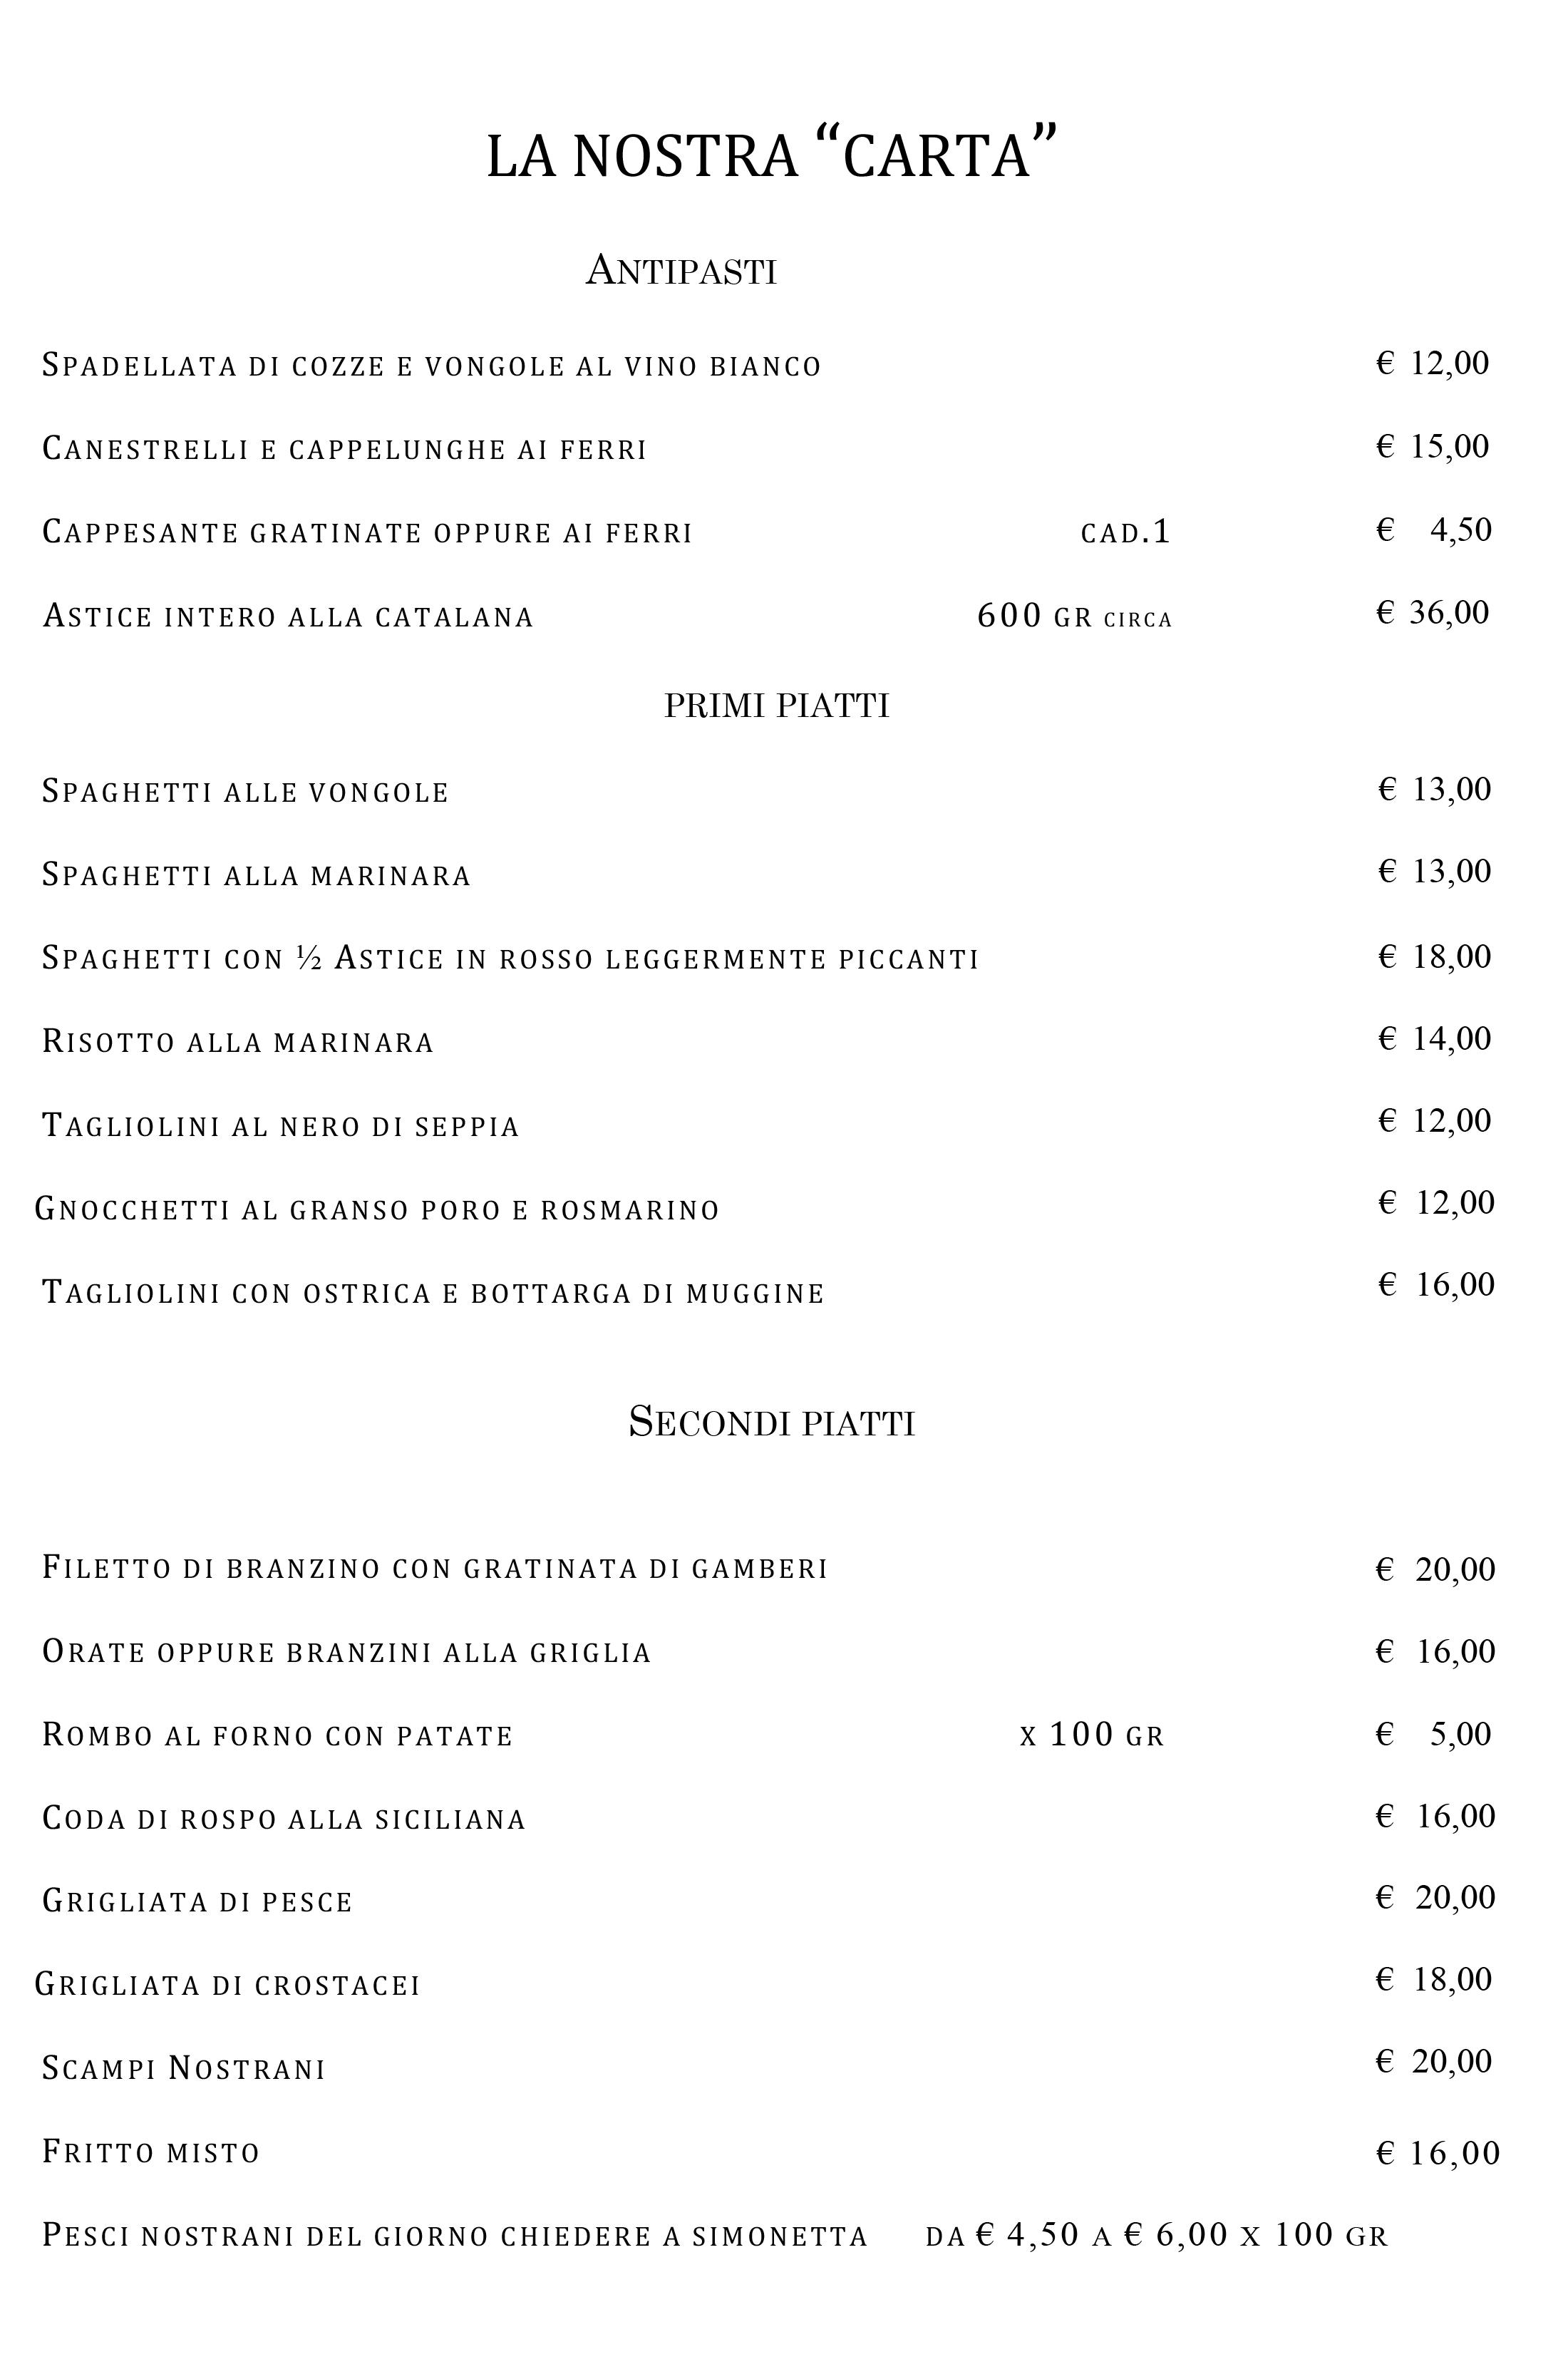 Microsoft Word - Da fernanda La Nostra Carta B.docx